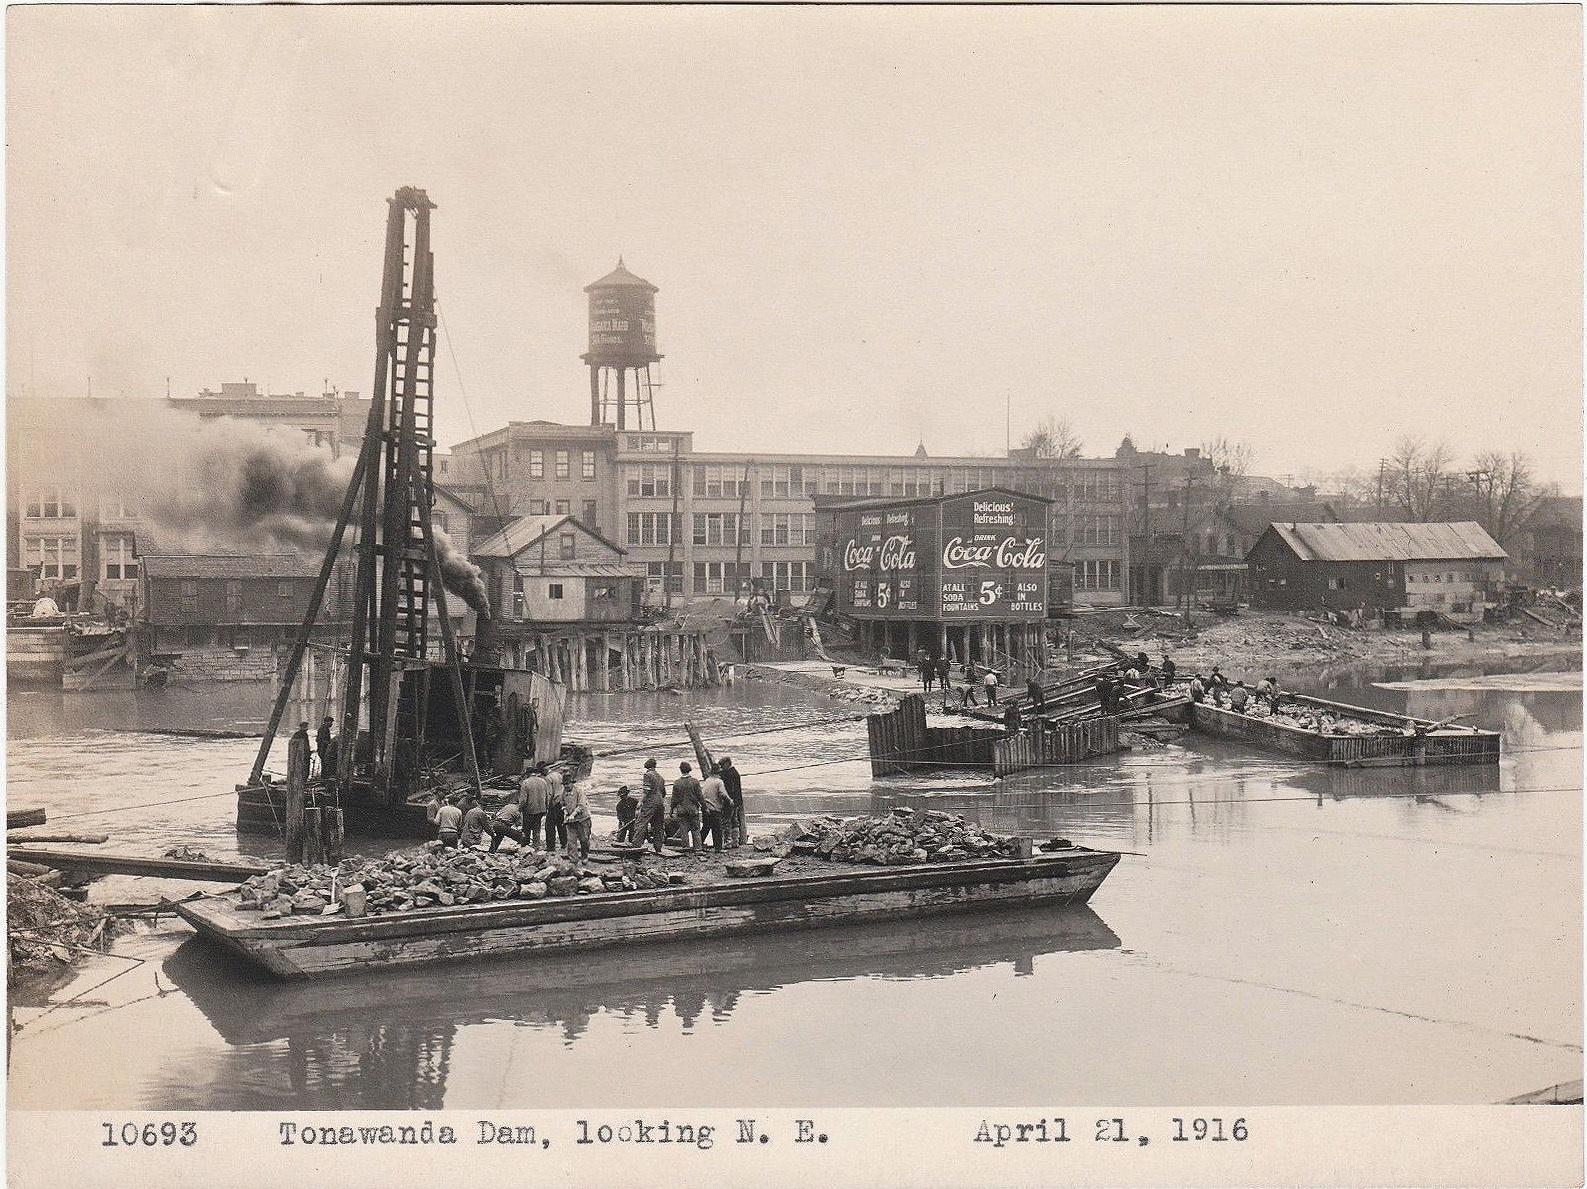 Tonawanda Dam, looking NE, photo (1916-04-21).jpg